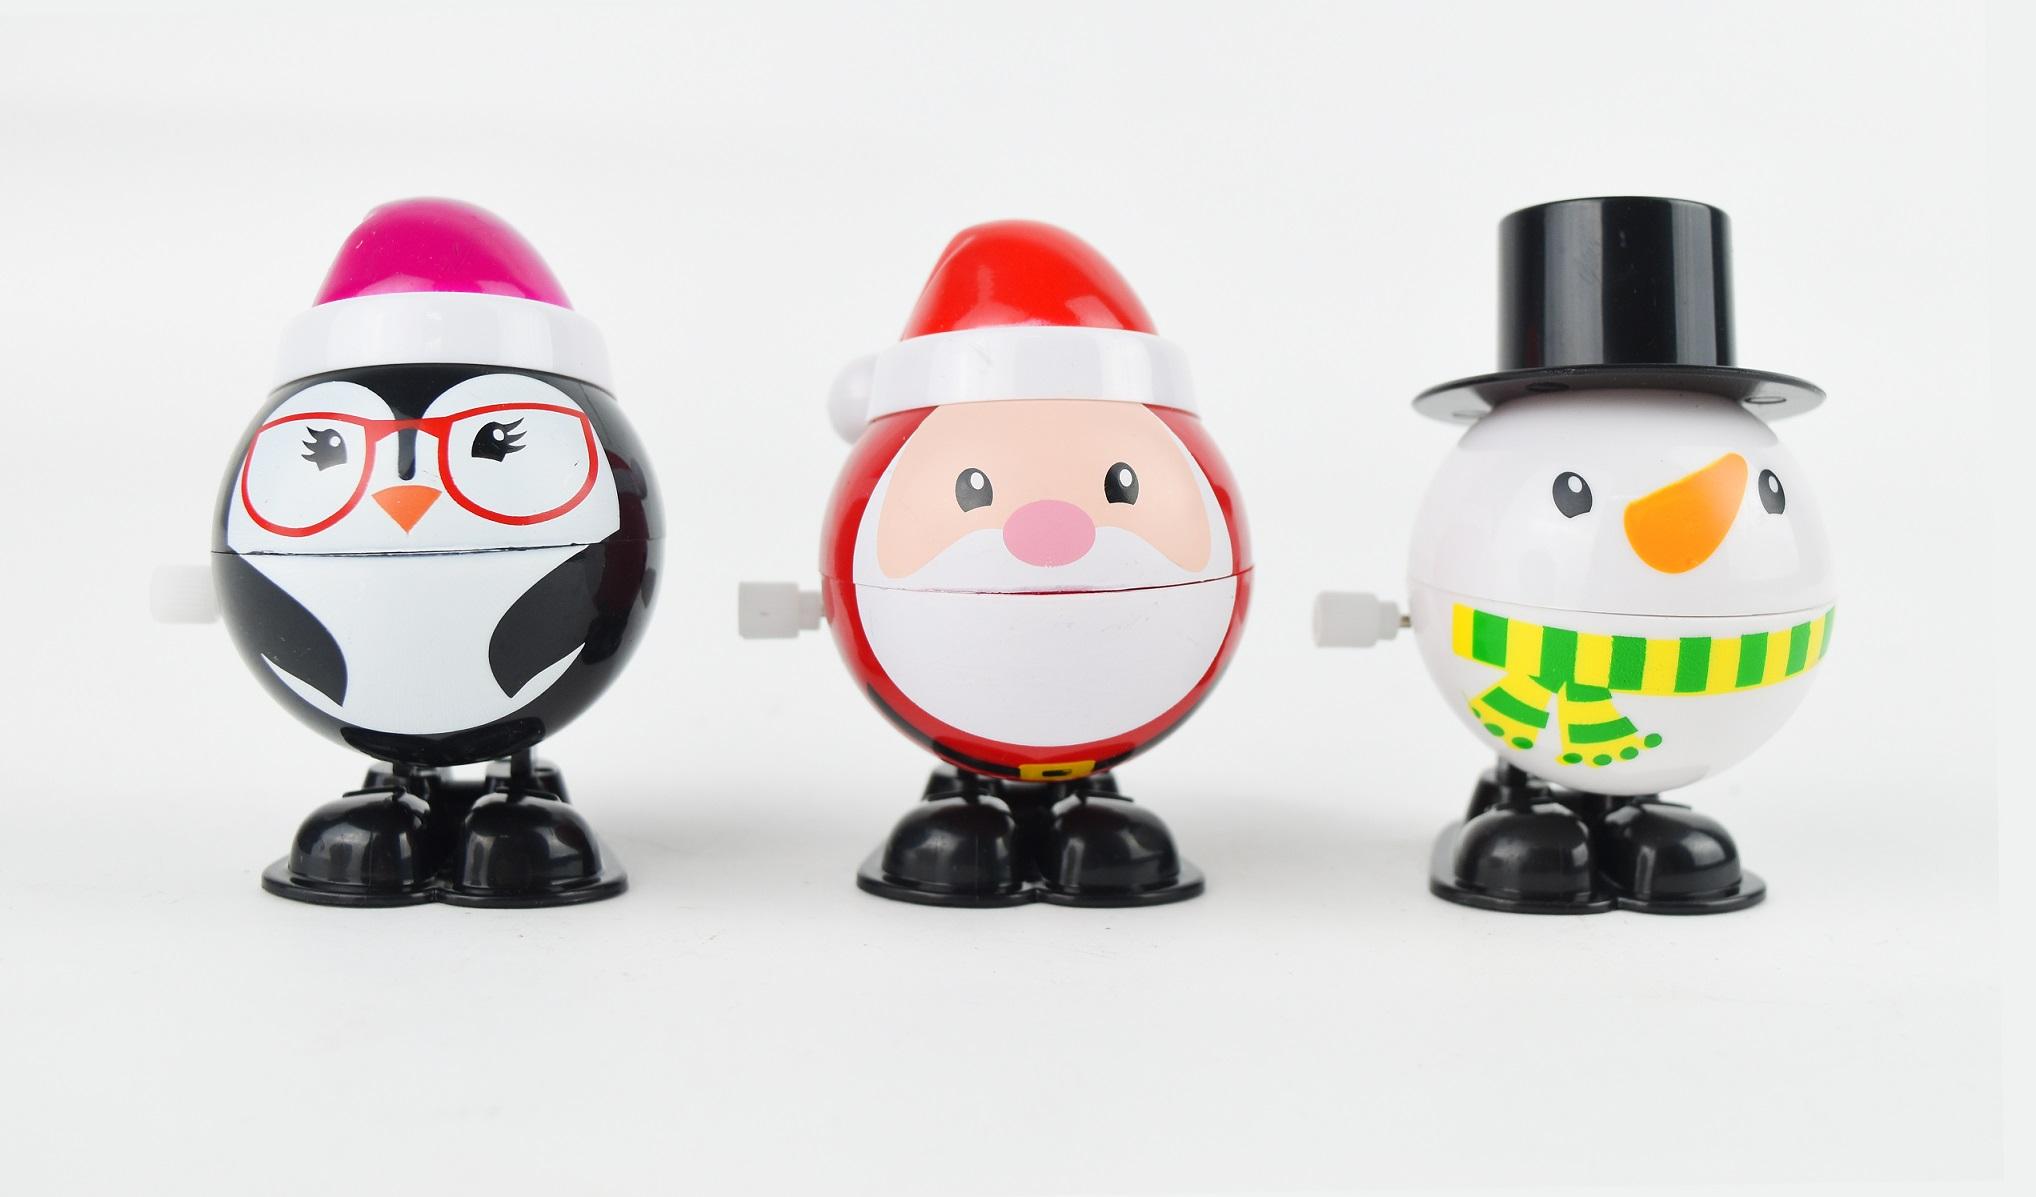 X射線【X419409】聖誕發條公仔(1入-隨機出貨不挑款),化妝舞會/造型/聖誕節/派對道具